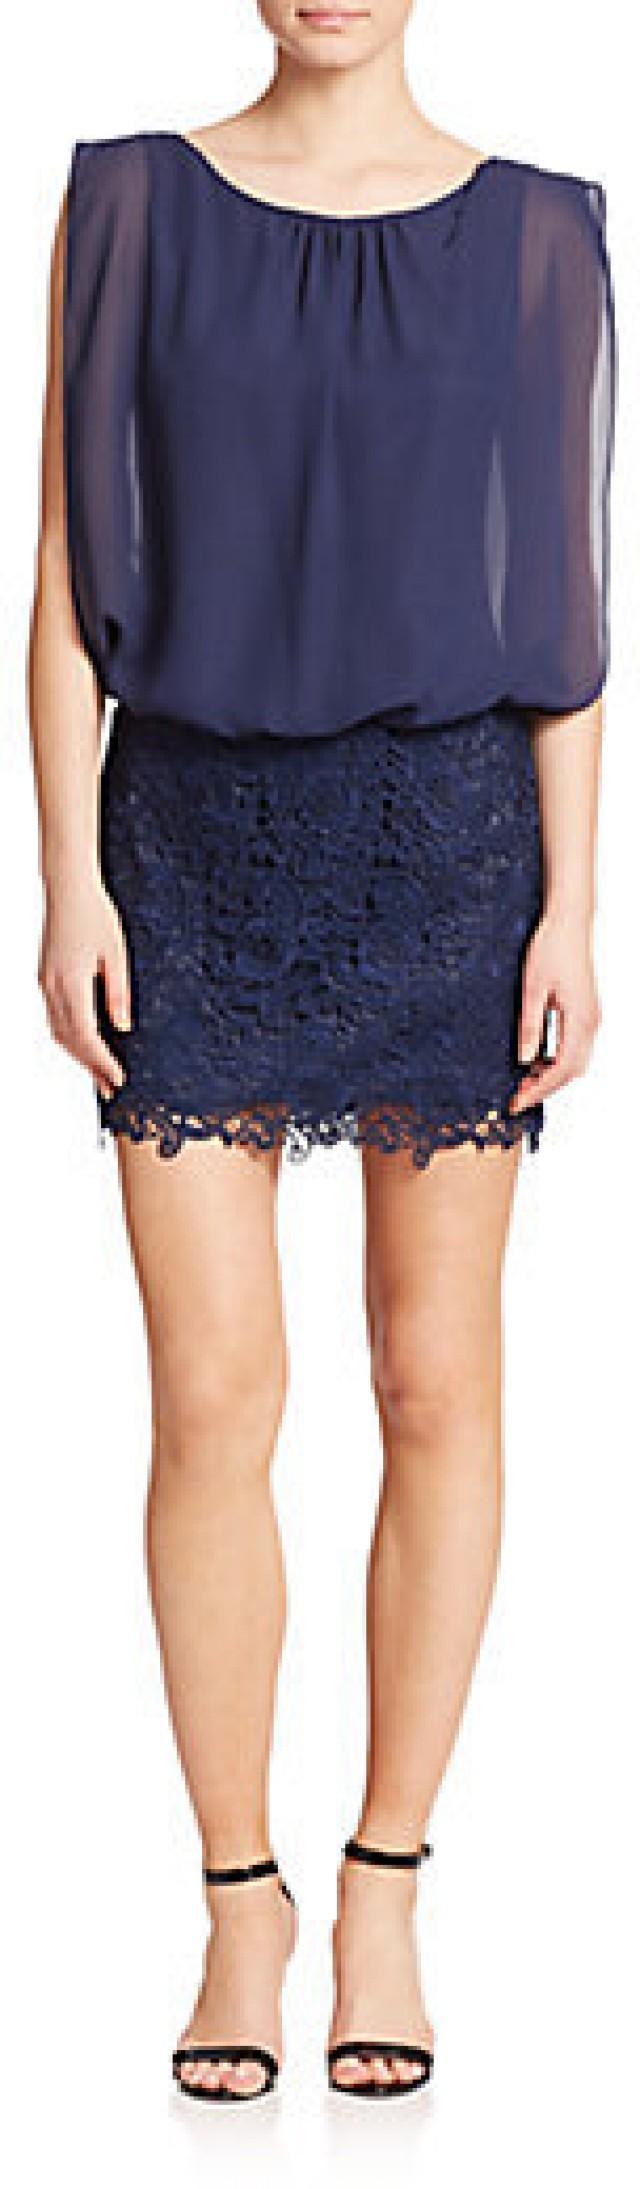 Aidan mattox lace skirt blouson bridesmaid dress 2277742 weddbook ombrellifo Choice Image